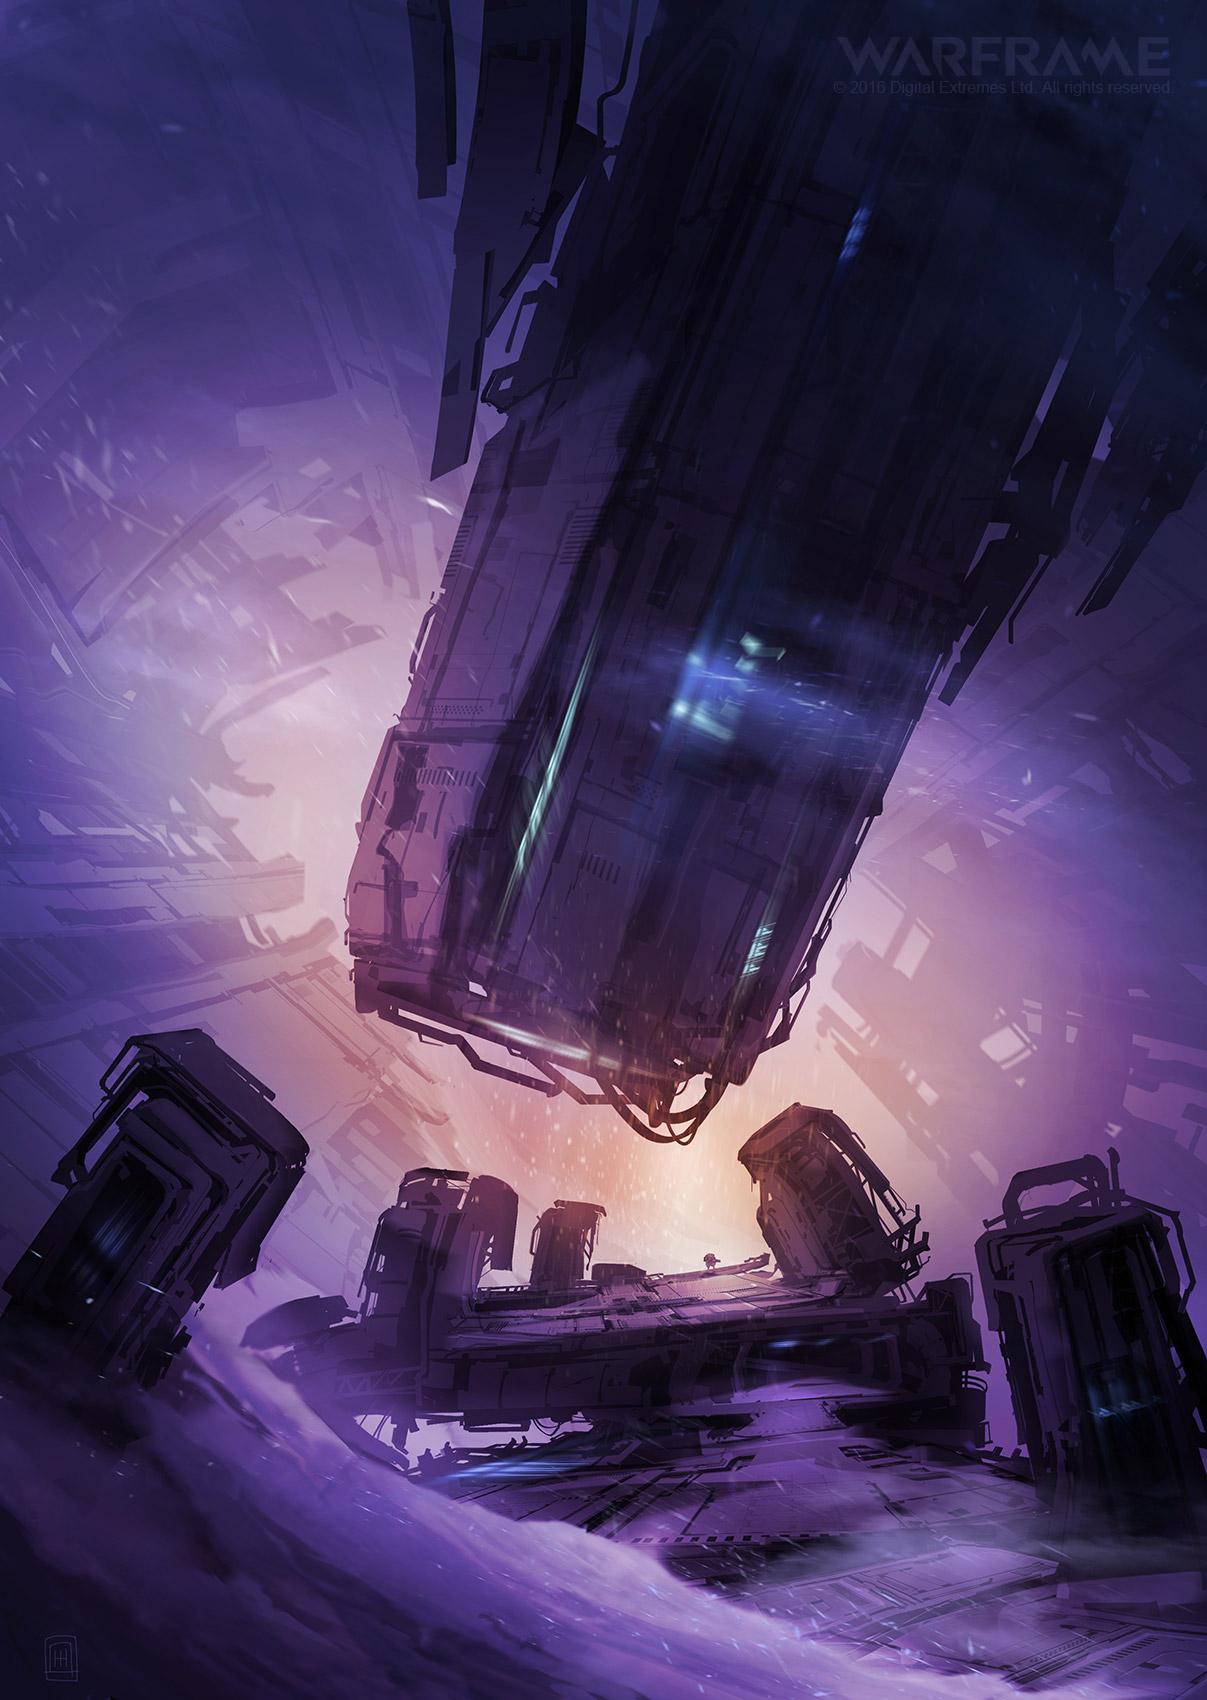 Warframe_Corpus_IcePlanet_Wreckage_S